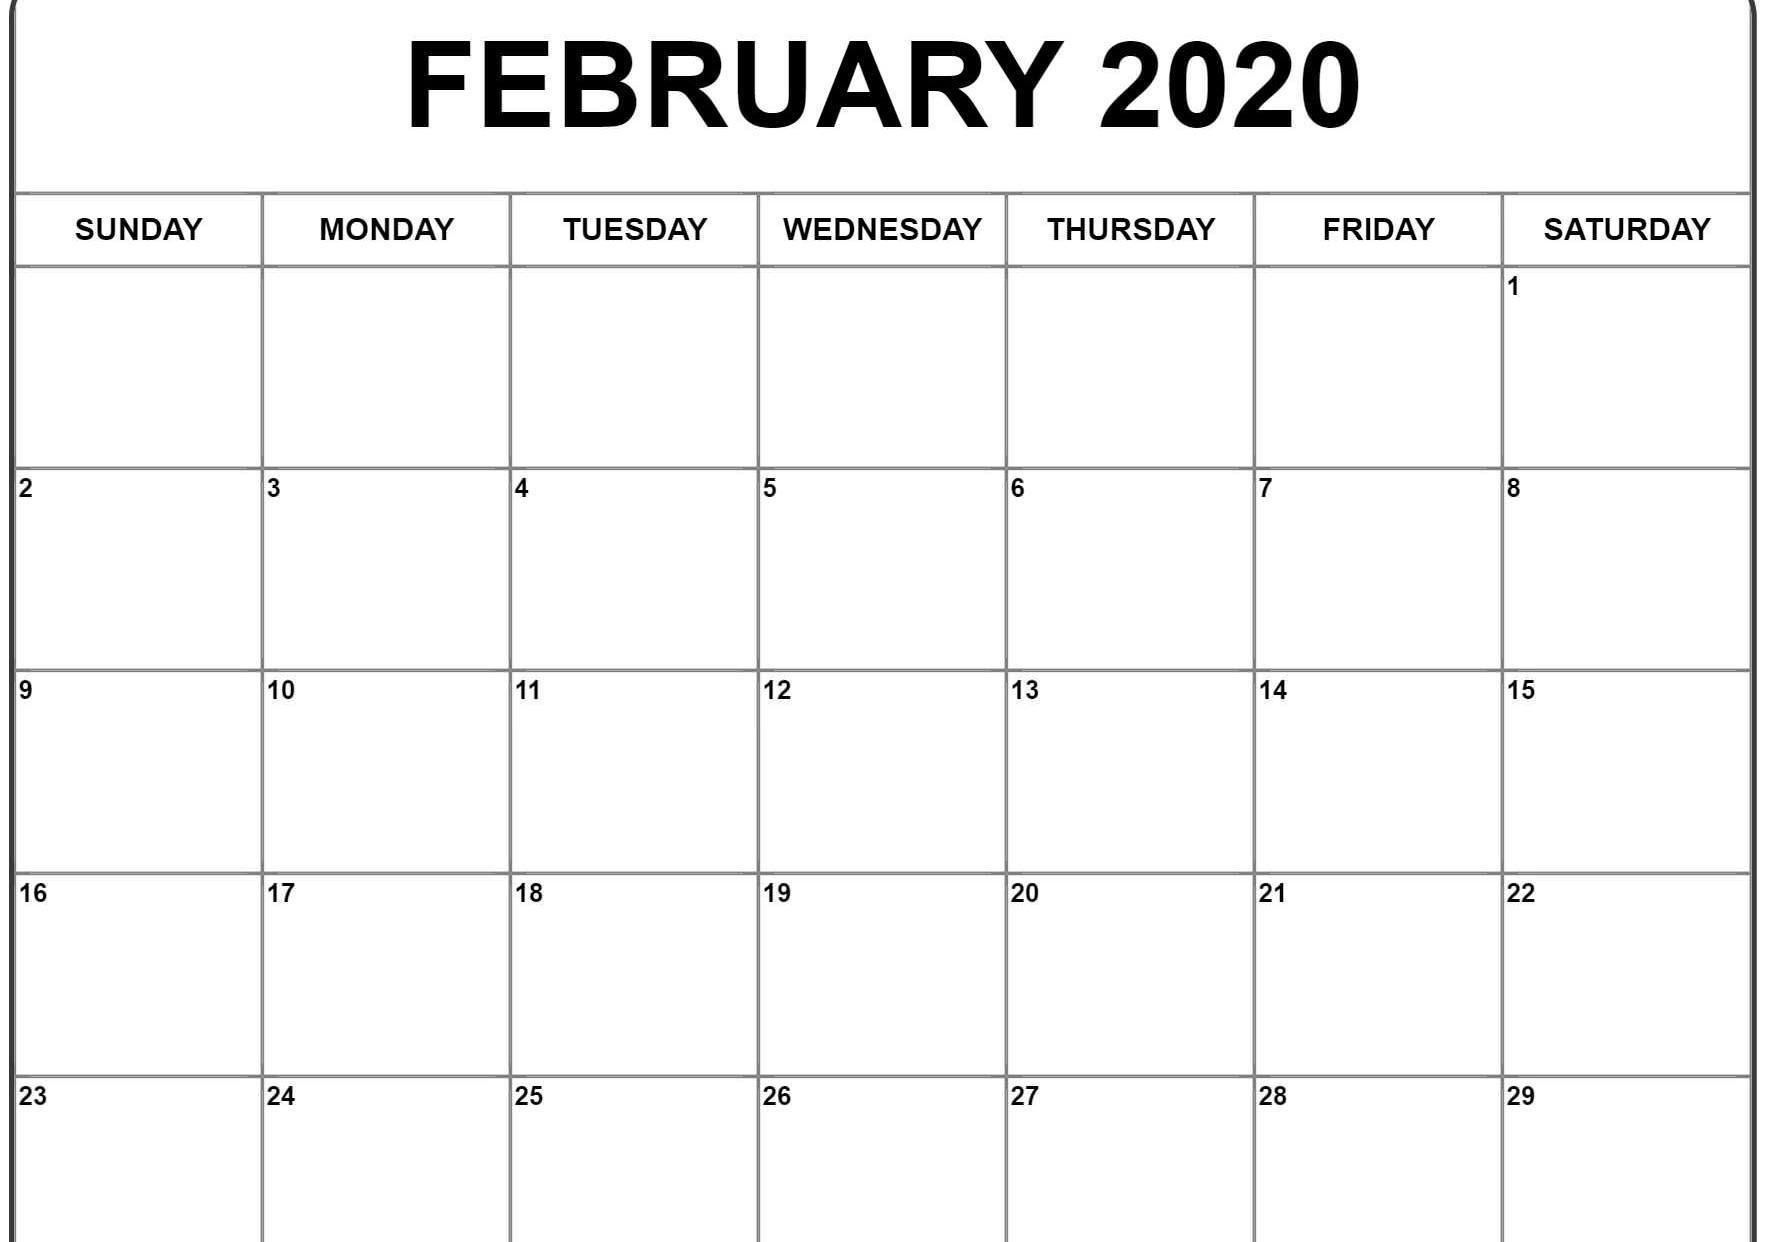 February 2020 Calendar Pdf, Word, Excel Printable Template